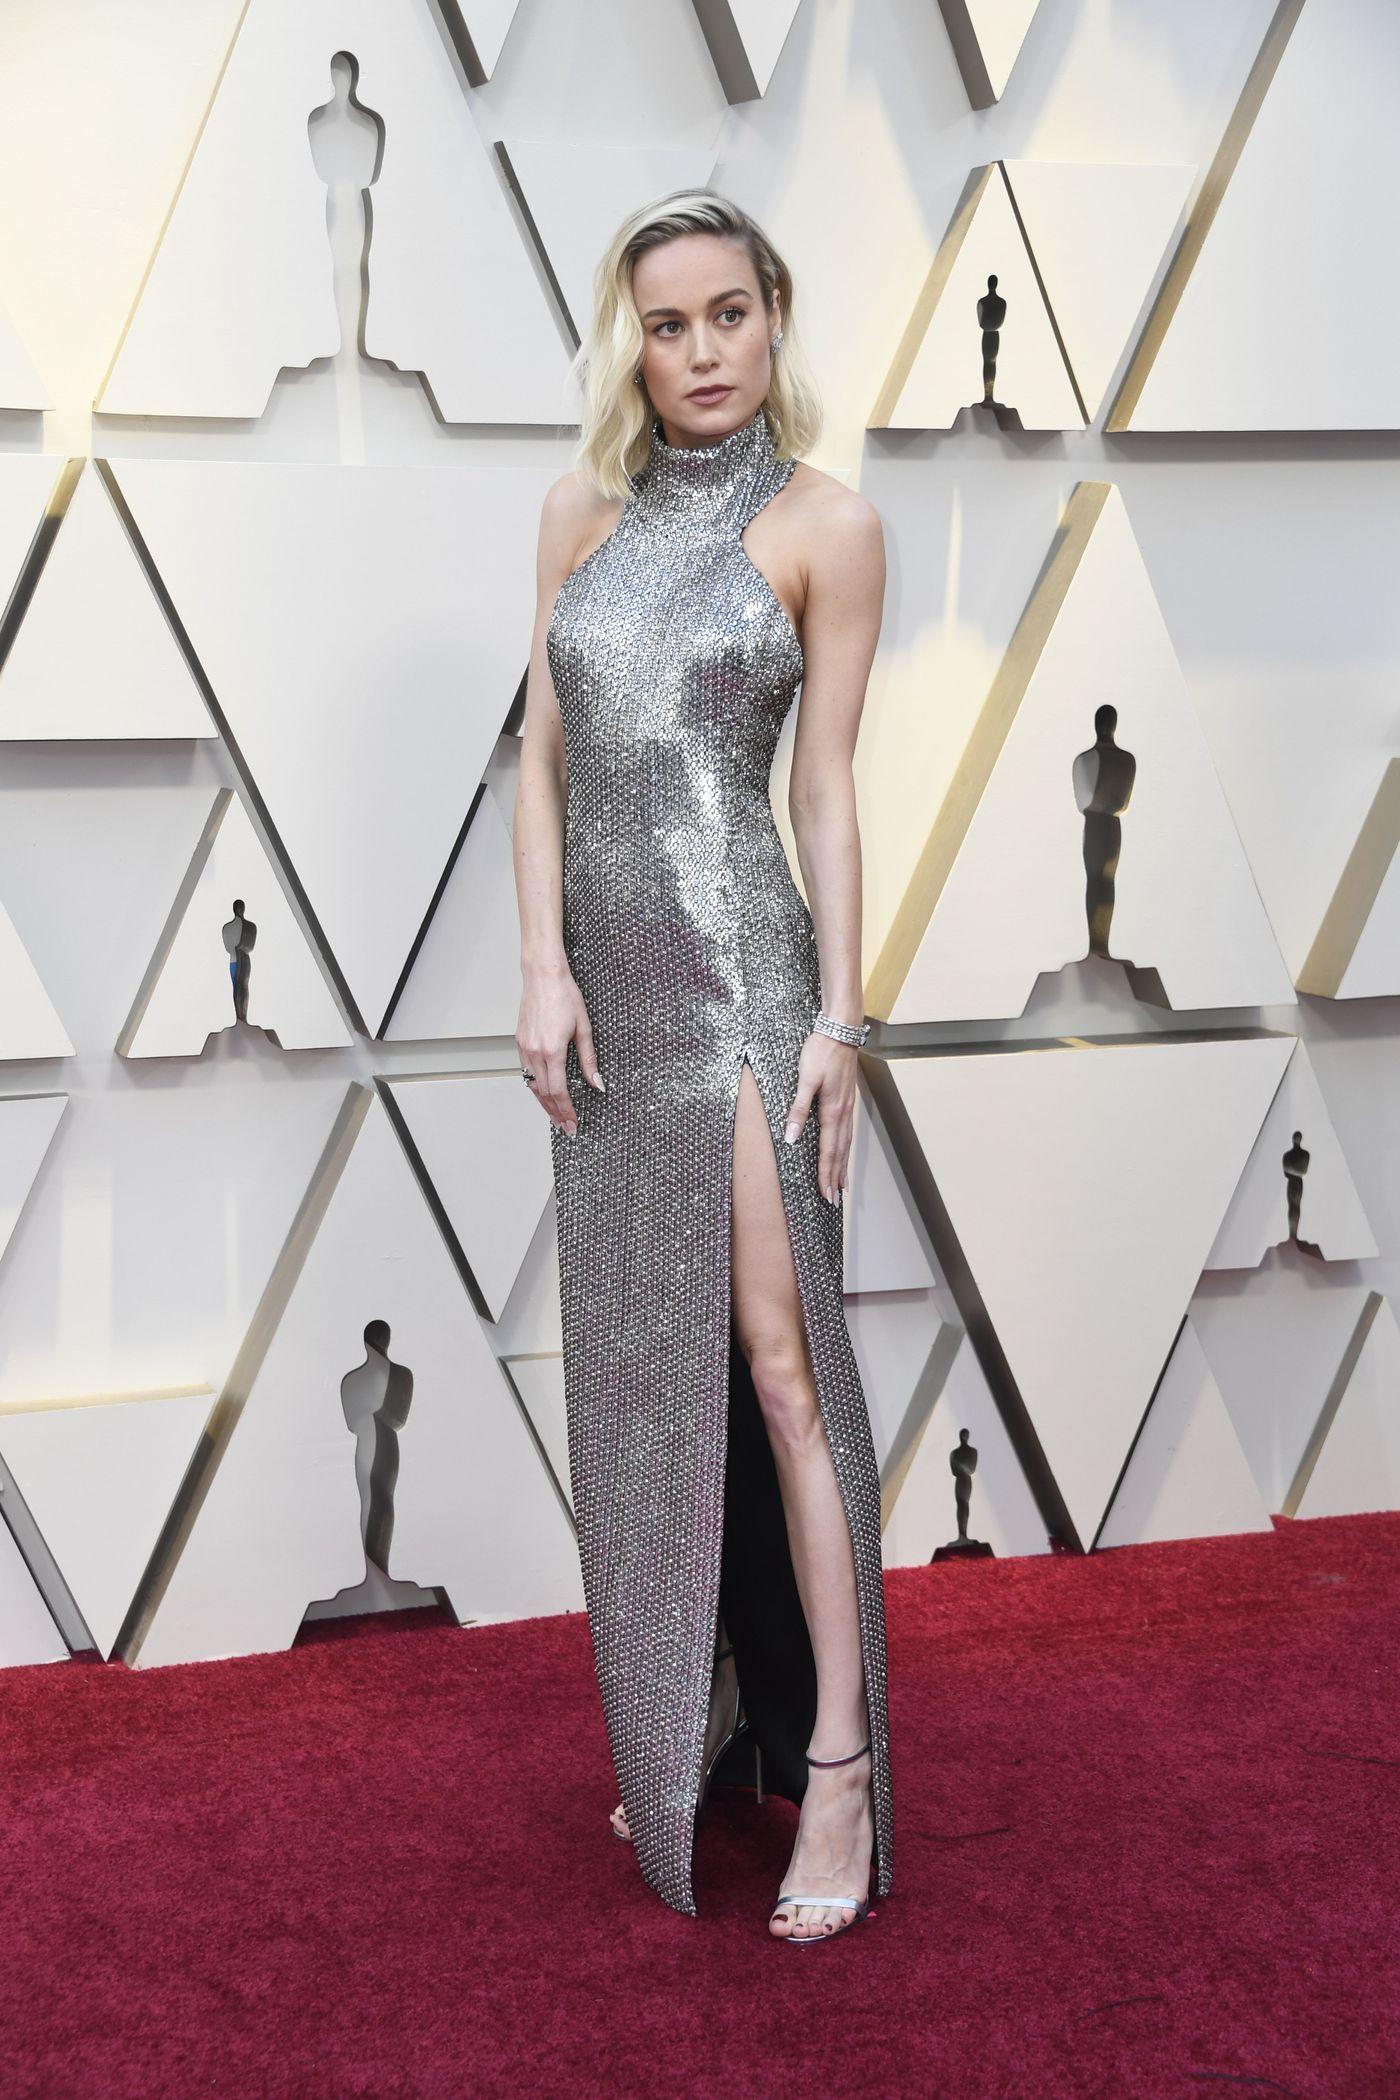 c8fcabcacf Oscars 2019: best-dressed celebrity fashion on the red carpet - Vox